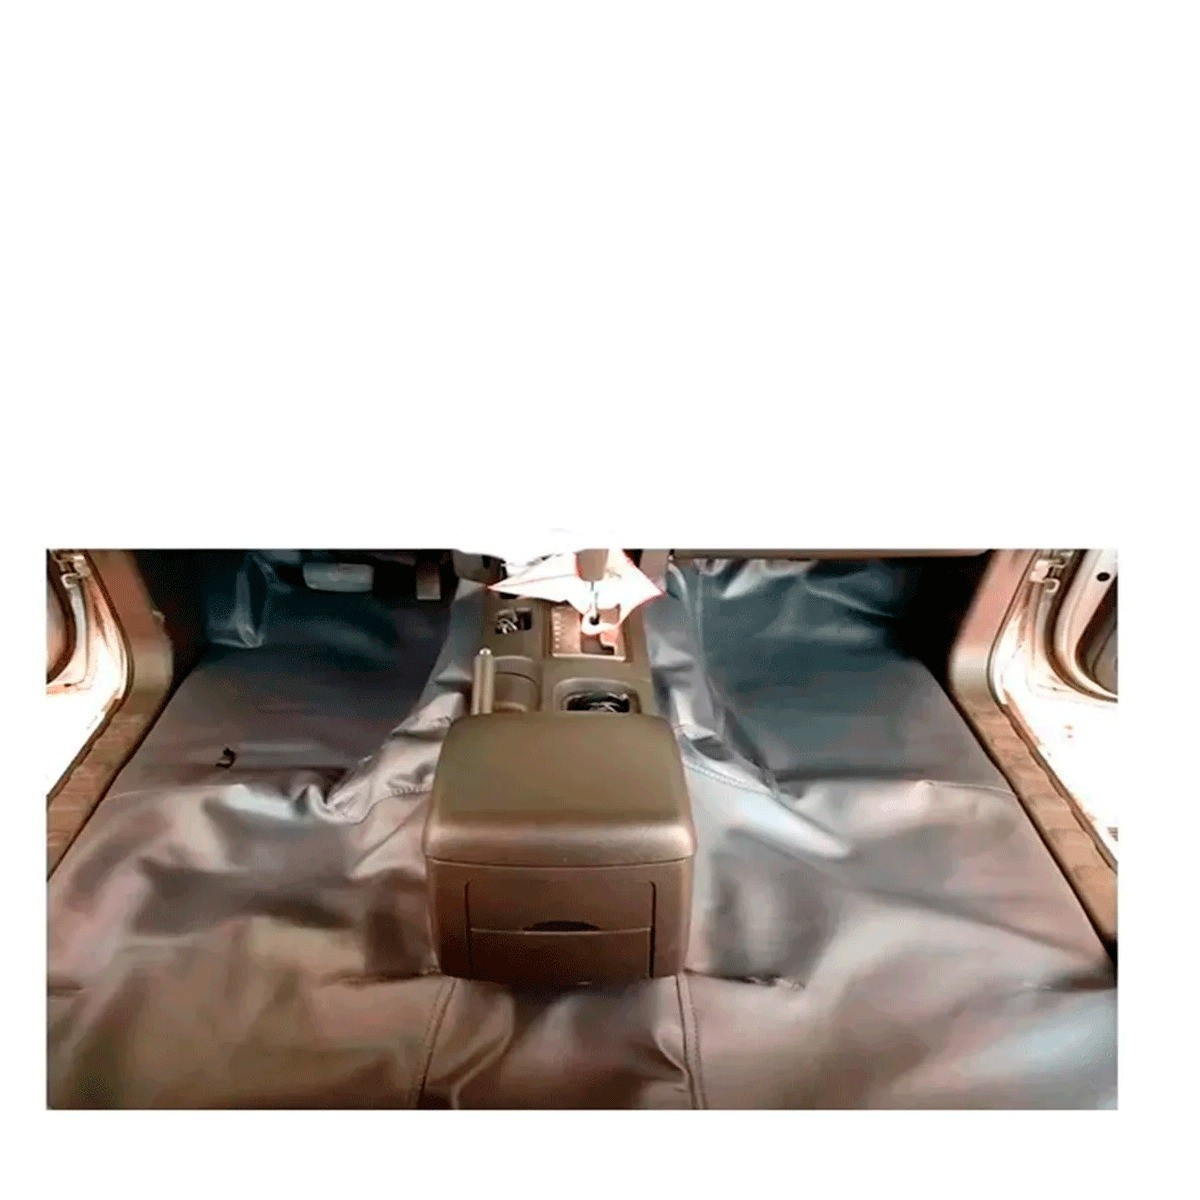 Tapete Automotivo Assoalho Emborrachado Bidim Volkswagen Golf 2008 a 2013